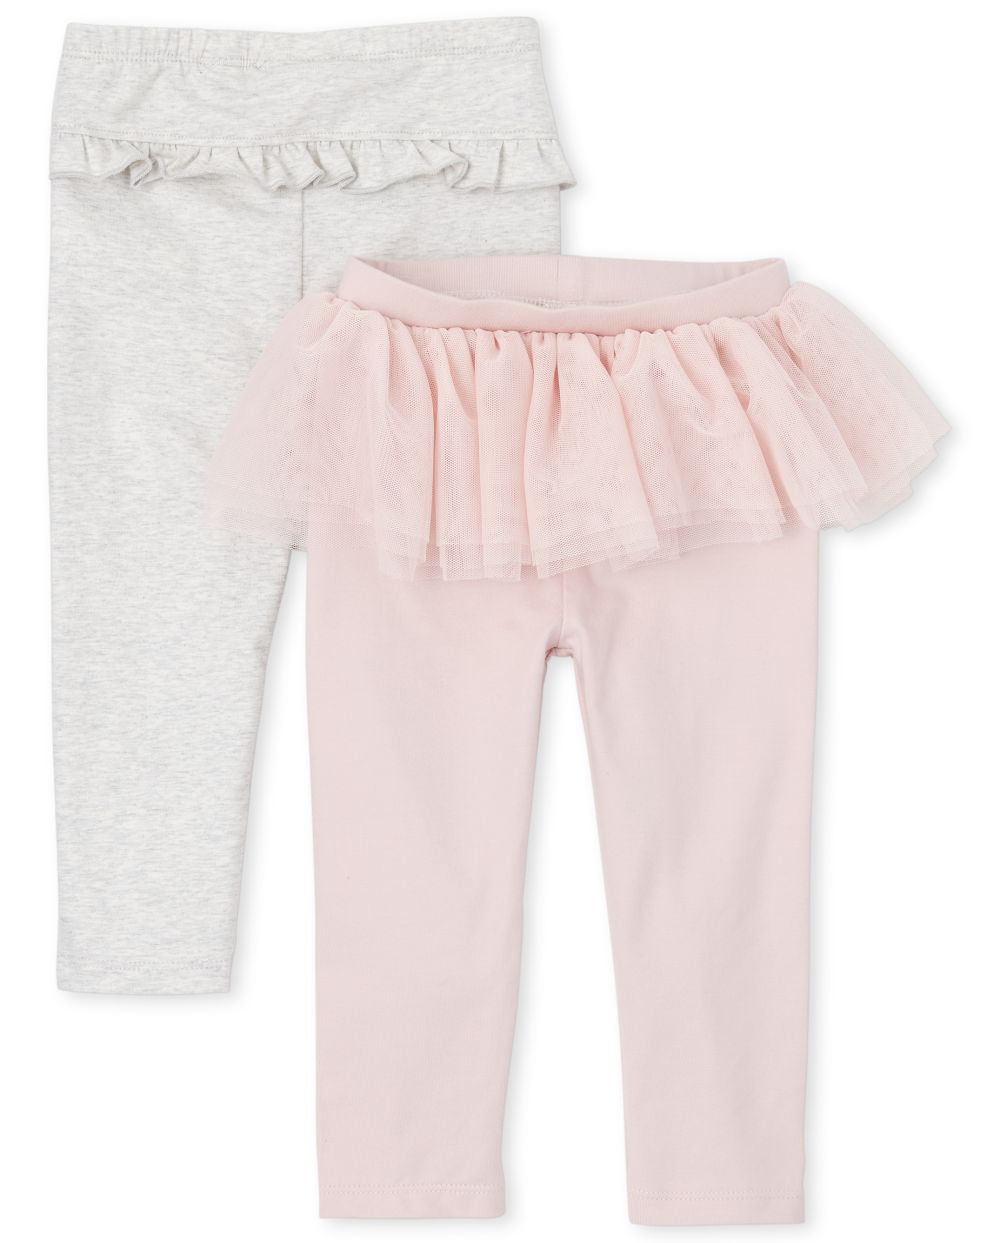 Baby Girls Tutu Pants 2-Pack